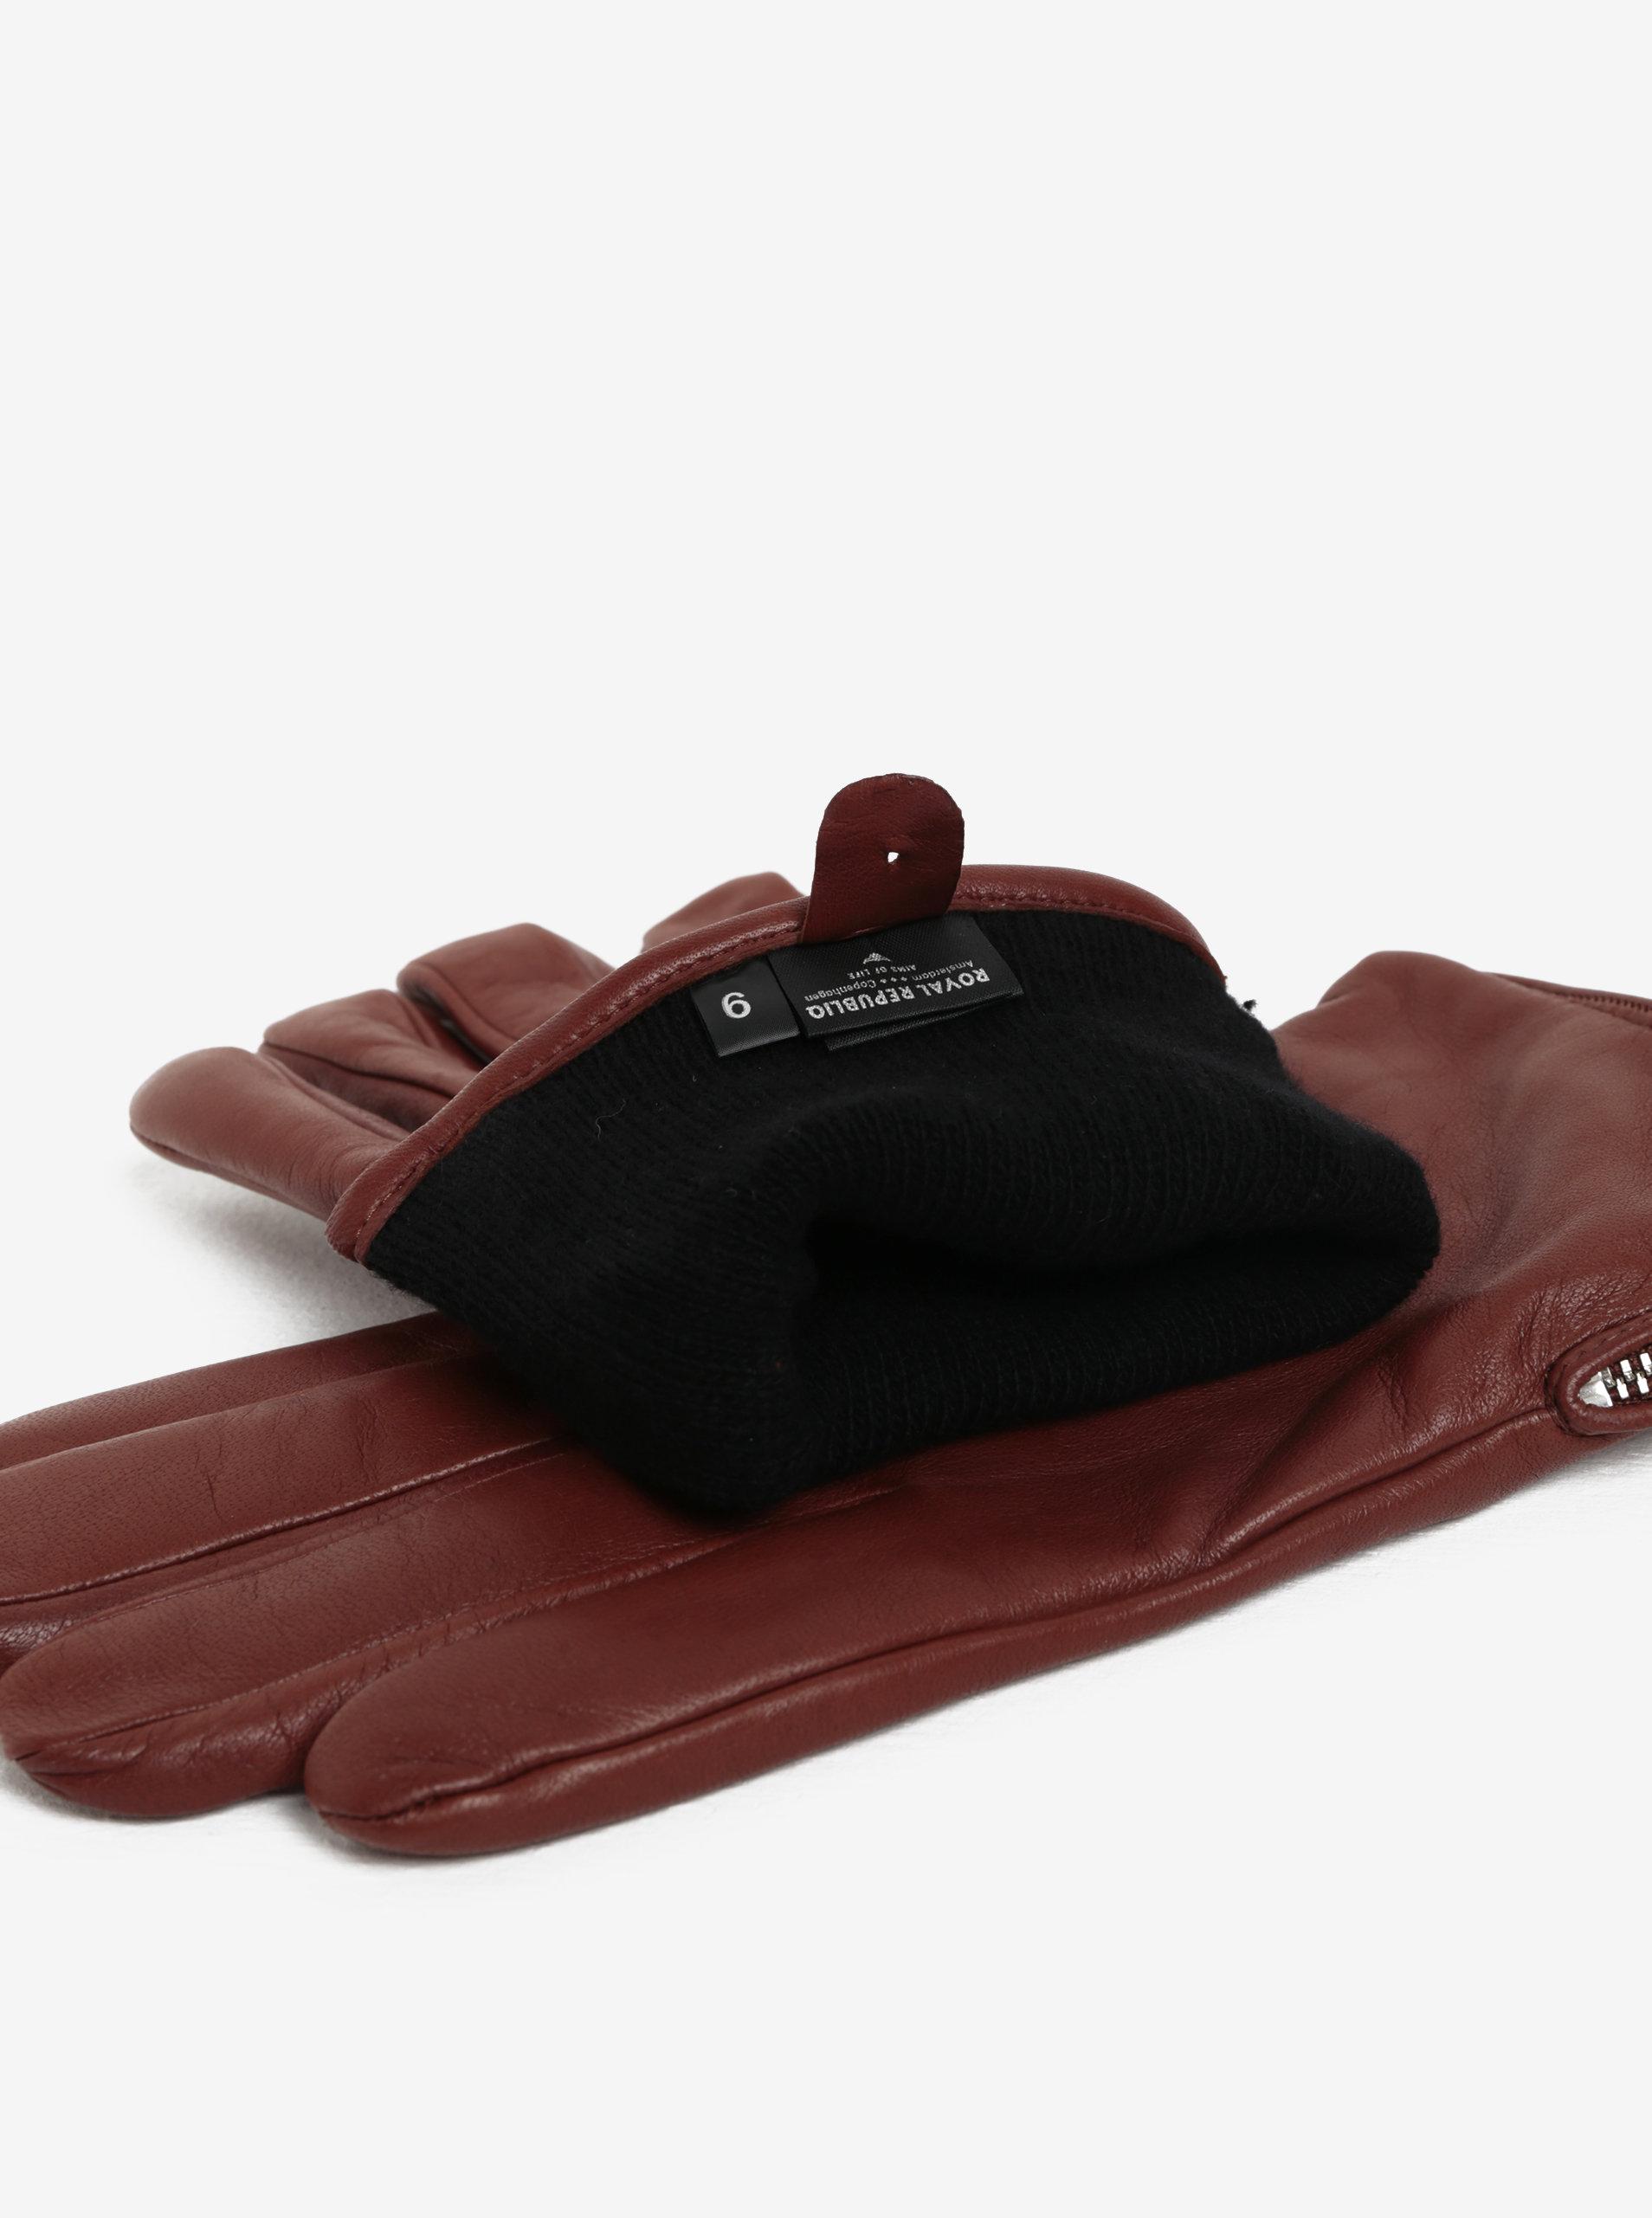 53d03fdecb9c Hnedé pánske kožené rukavice so zipsom a kašmírovou podšívkou Royal RepubiQ  ...